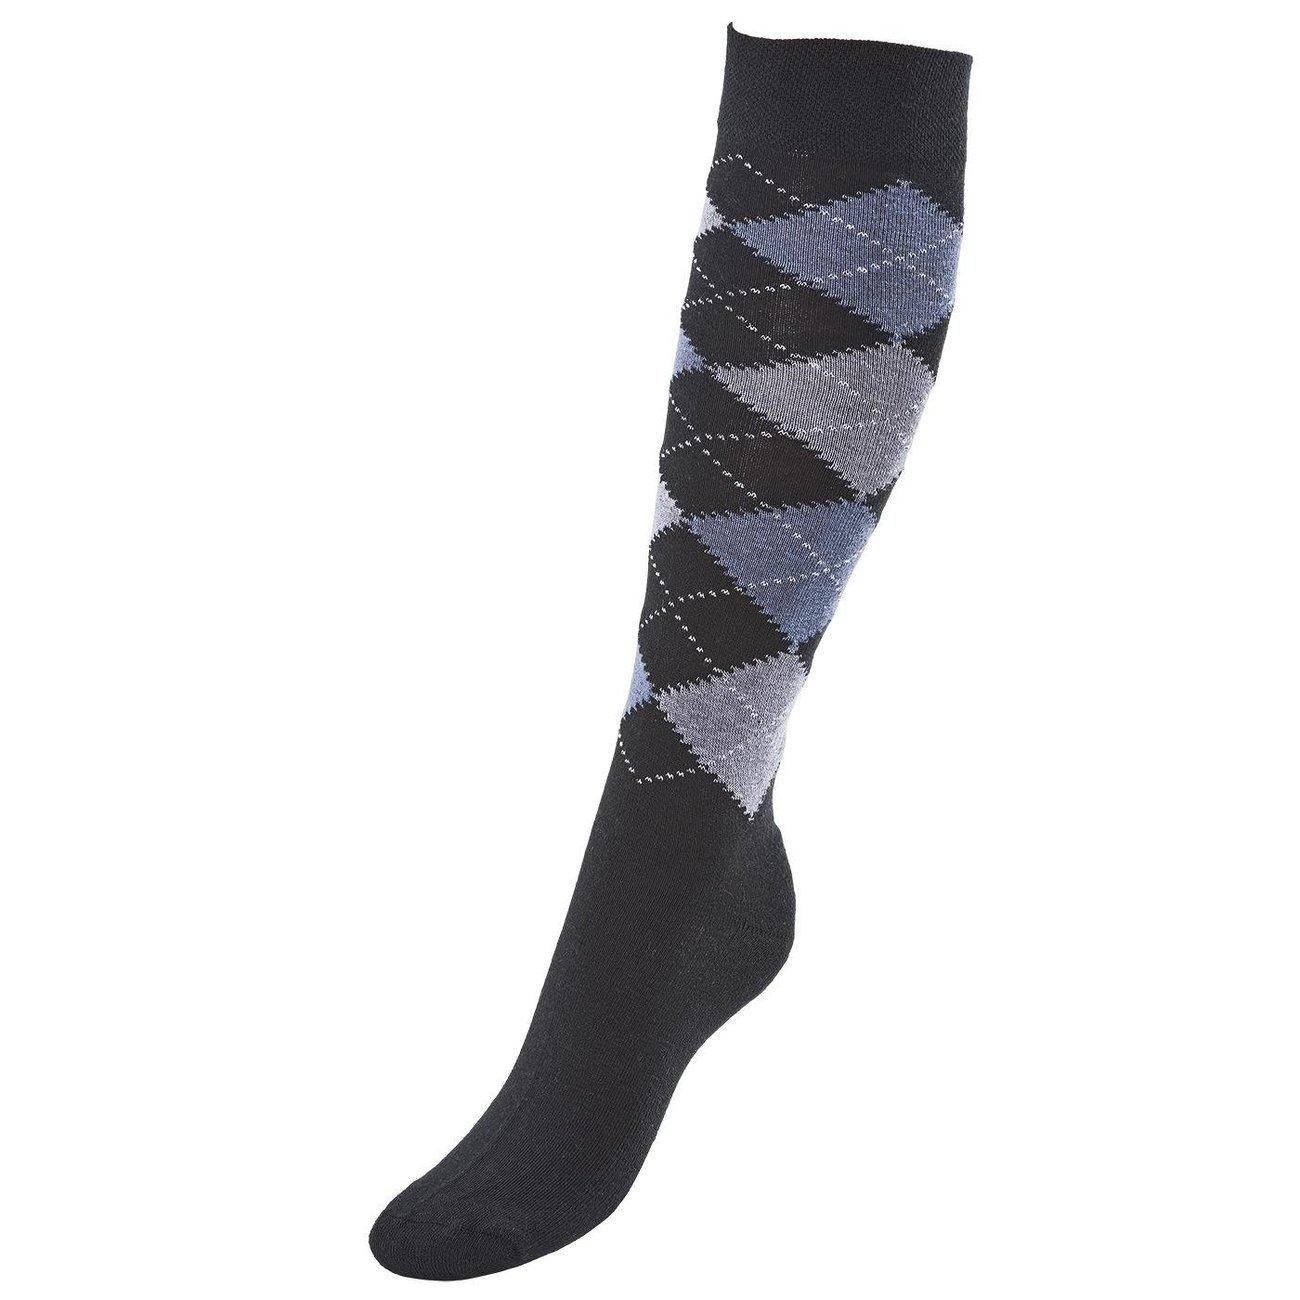 BUSSE Charm Socken, Bild 2